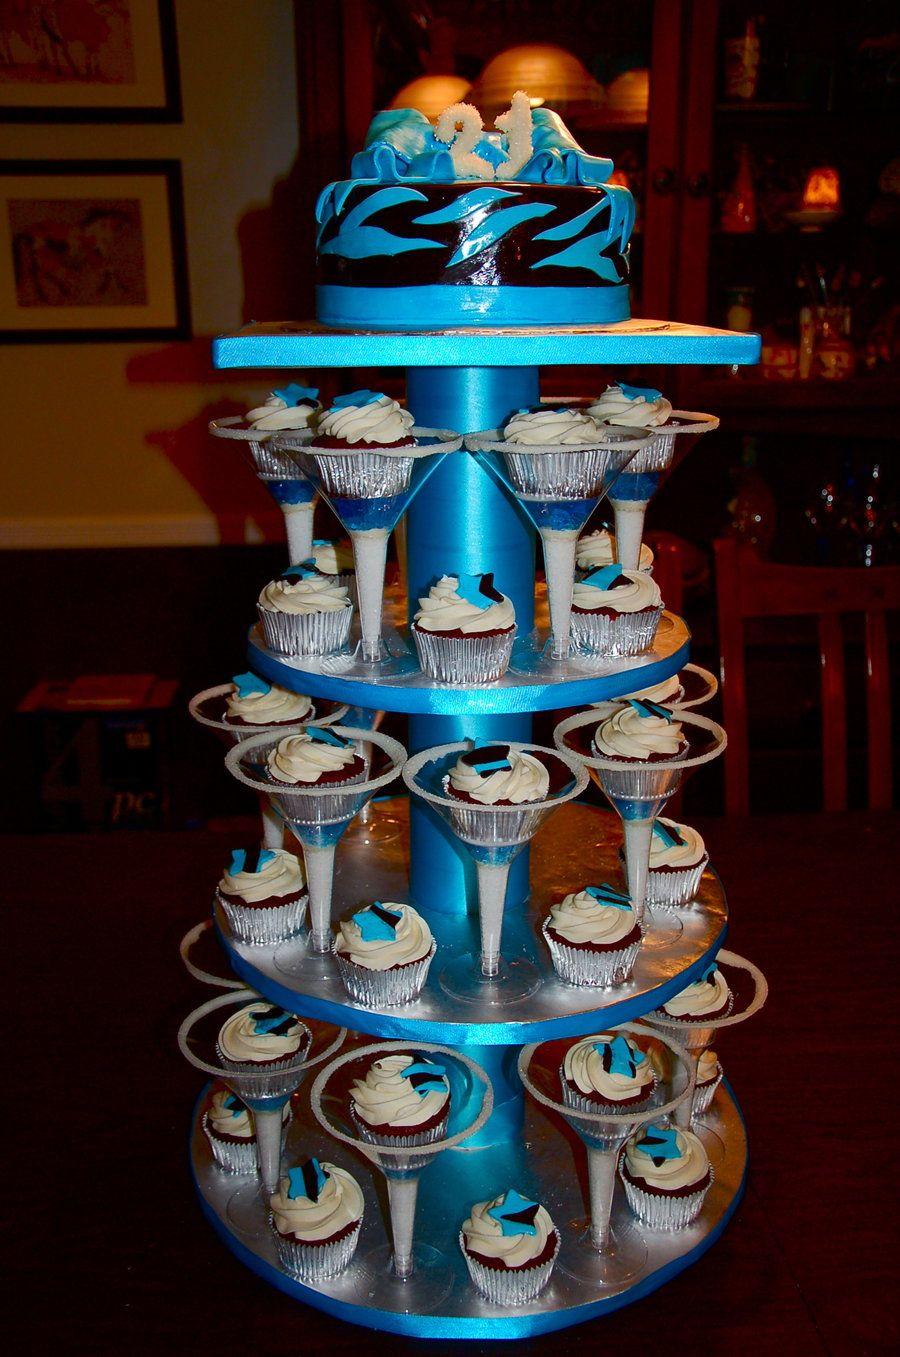 21st Birthday Cupcakes Full Display By Keep It Sweetiantart